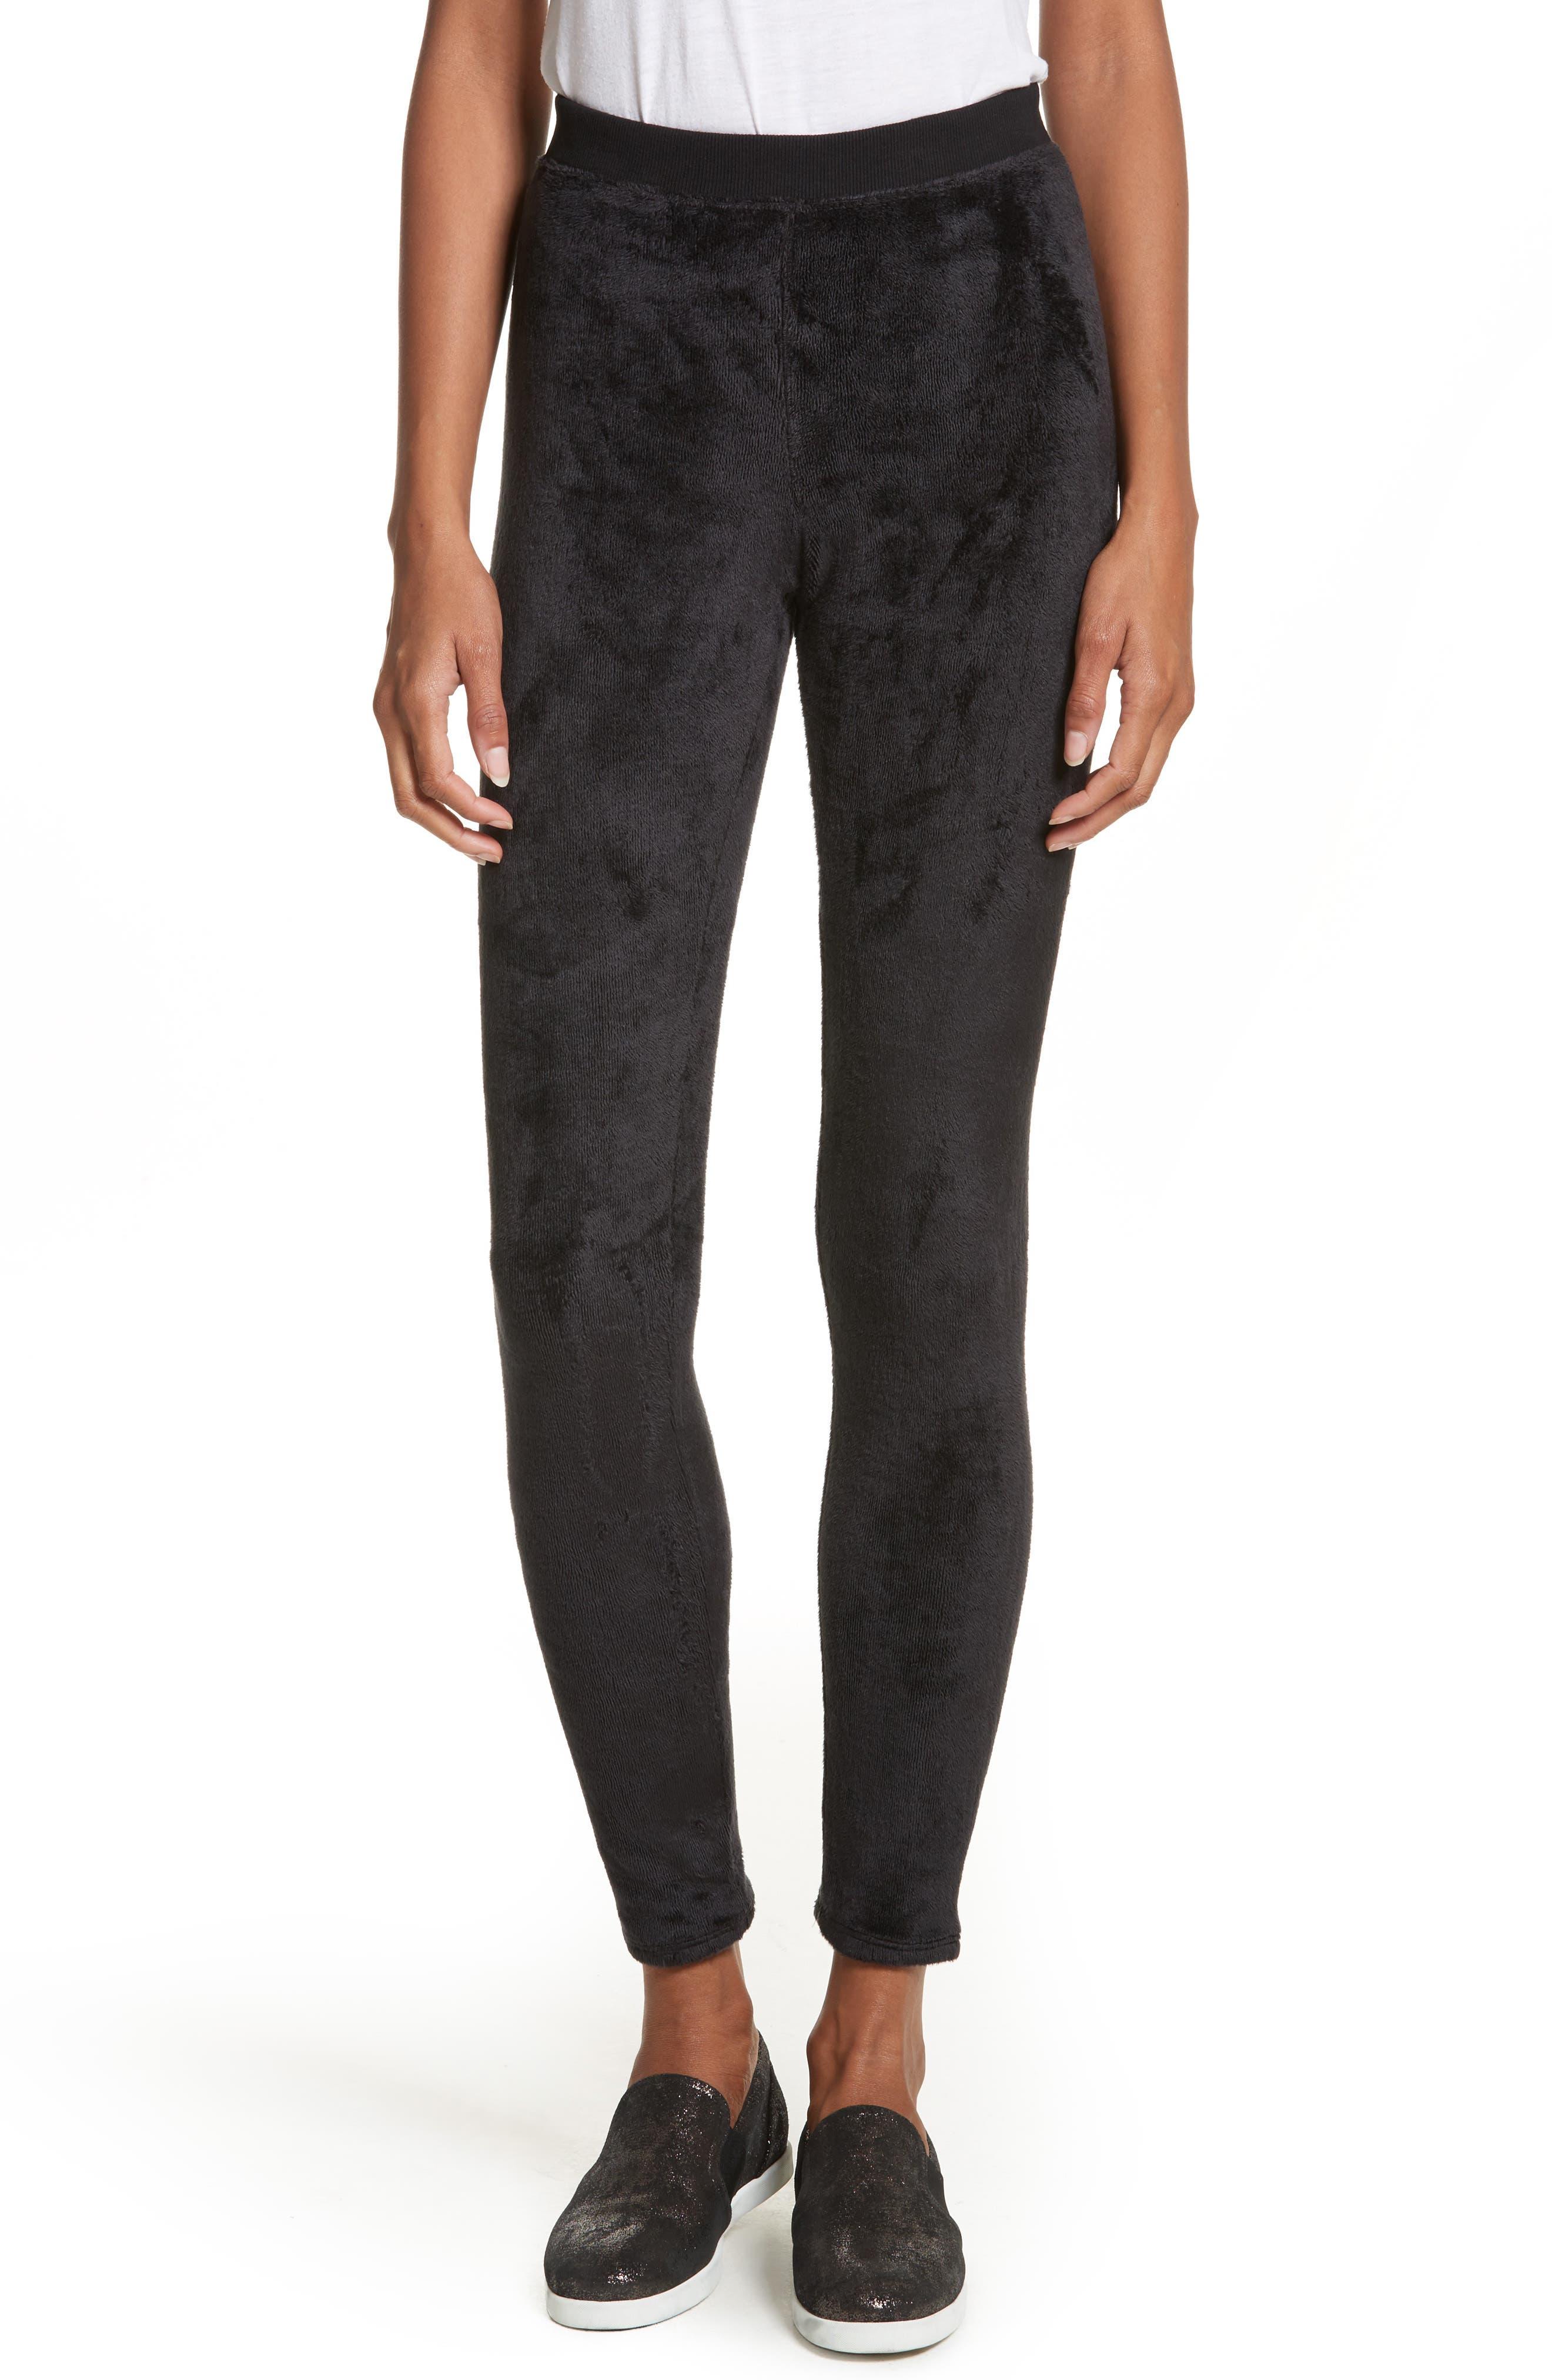 Velour Yoga Leggings,                         Main,                         color, Black